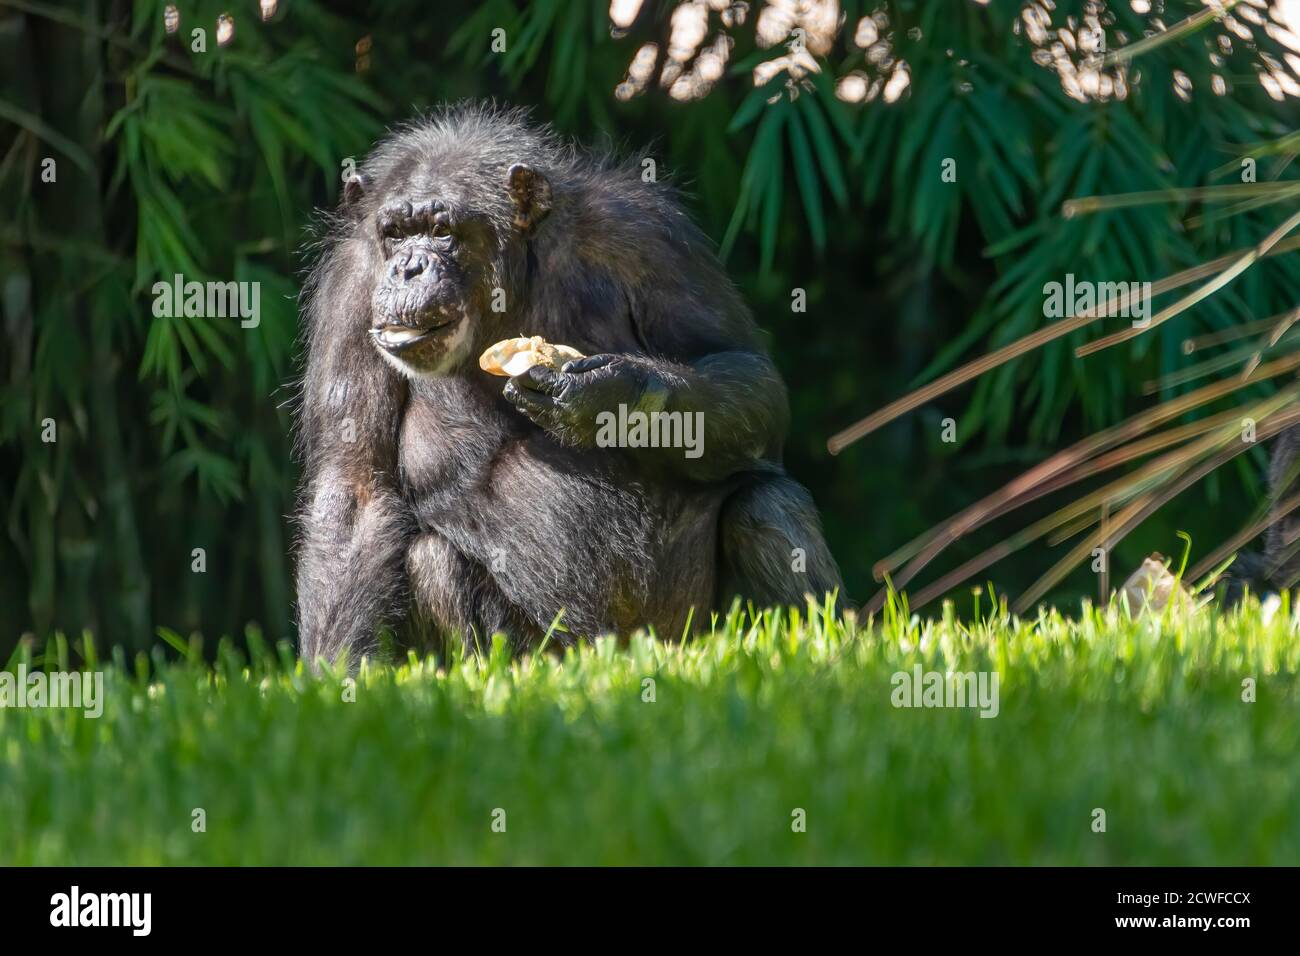 Grande scimpanzé (Pan troglodytes) a Busch Gardens Tampa Bay a Tampa, Florida. (STATI UNITI) Foto Stock